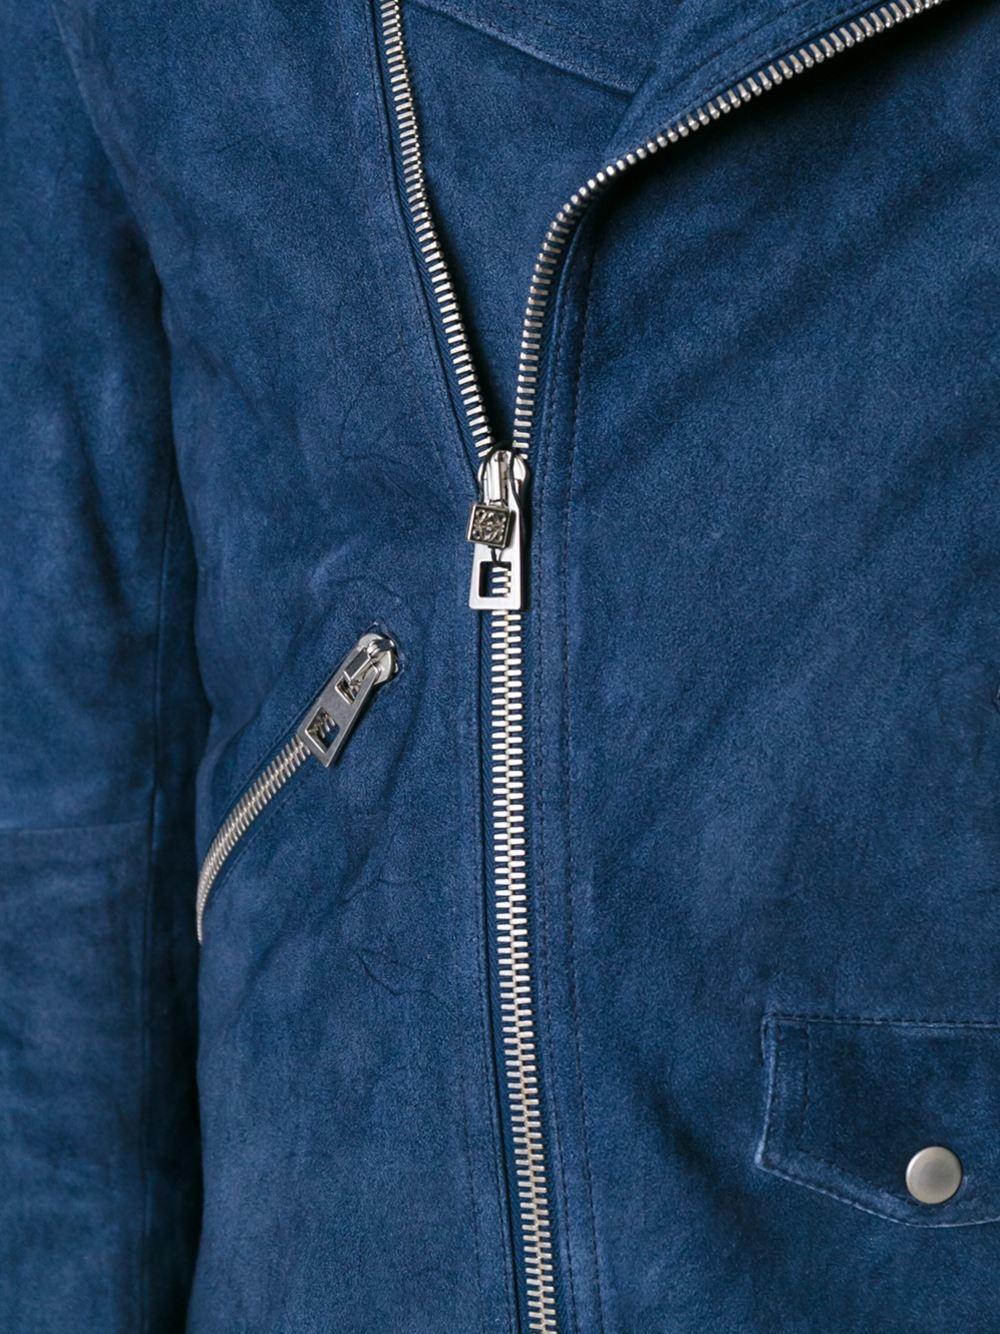 Loewe Suede Biker Jacket in Blue for Men